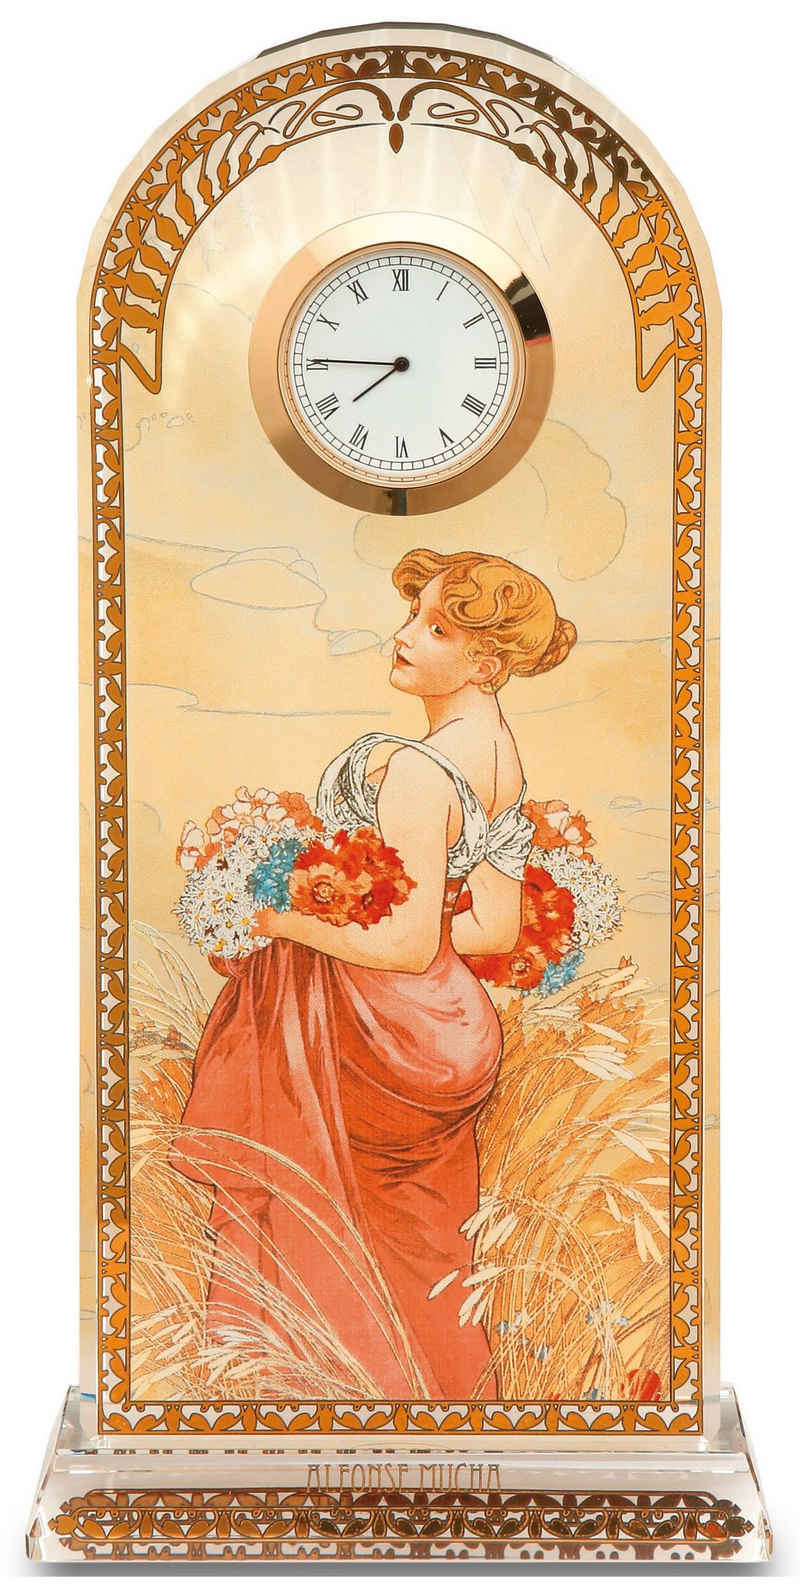 "Goebel Tischuhr »Artis Orbis - Alphonse Mucha - ""Sommer"", 66523251«"